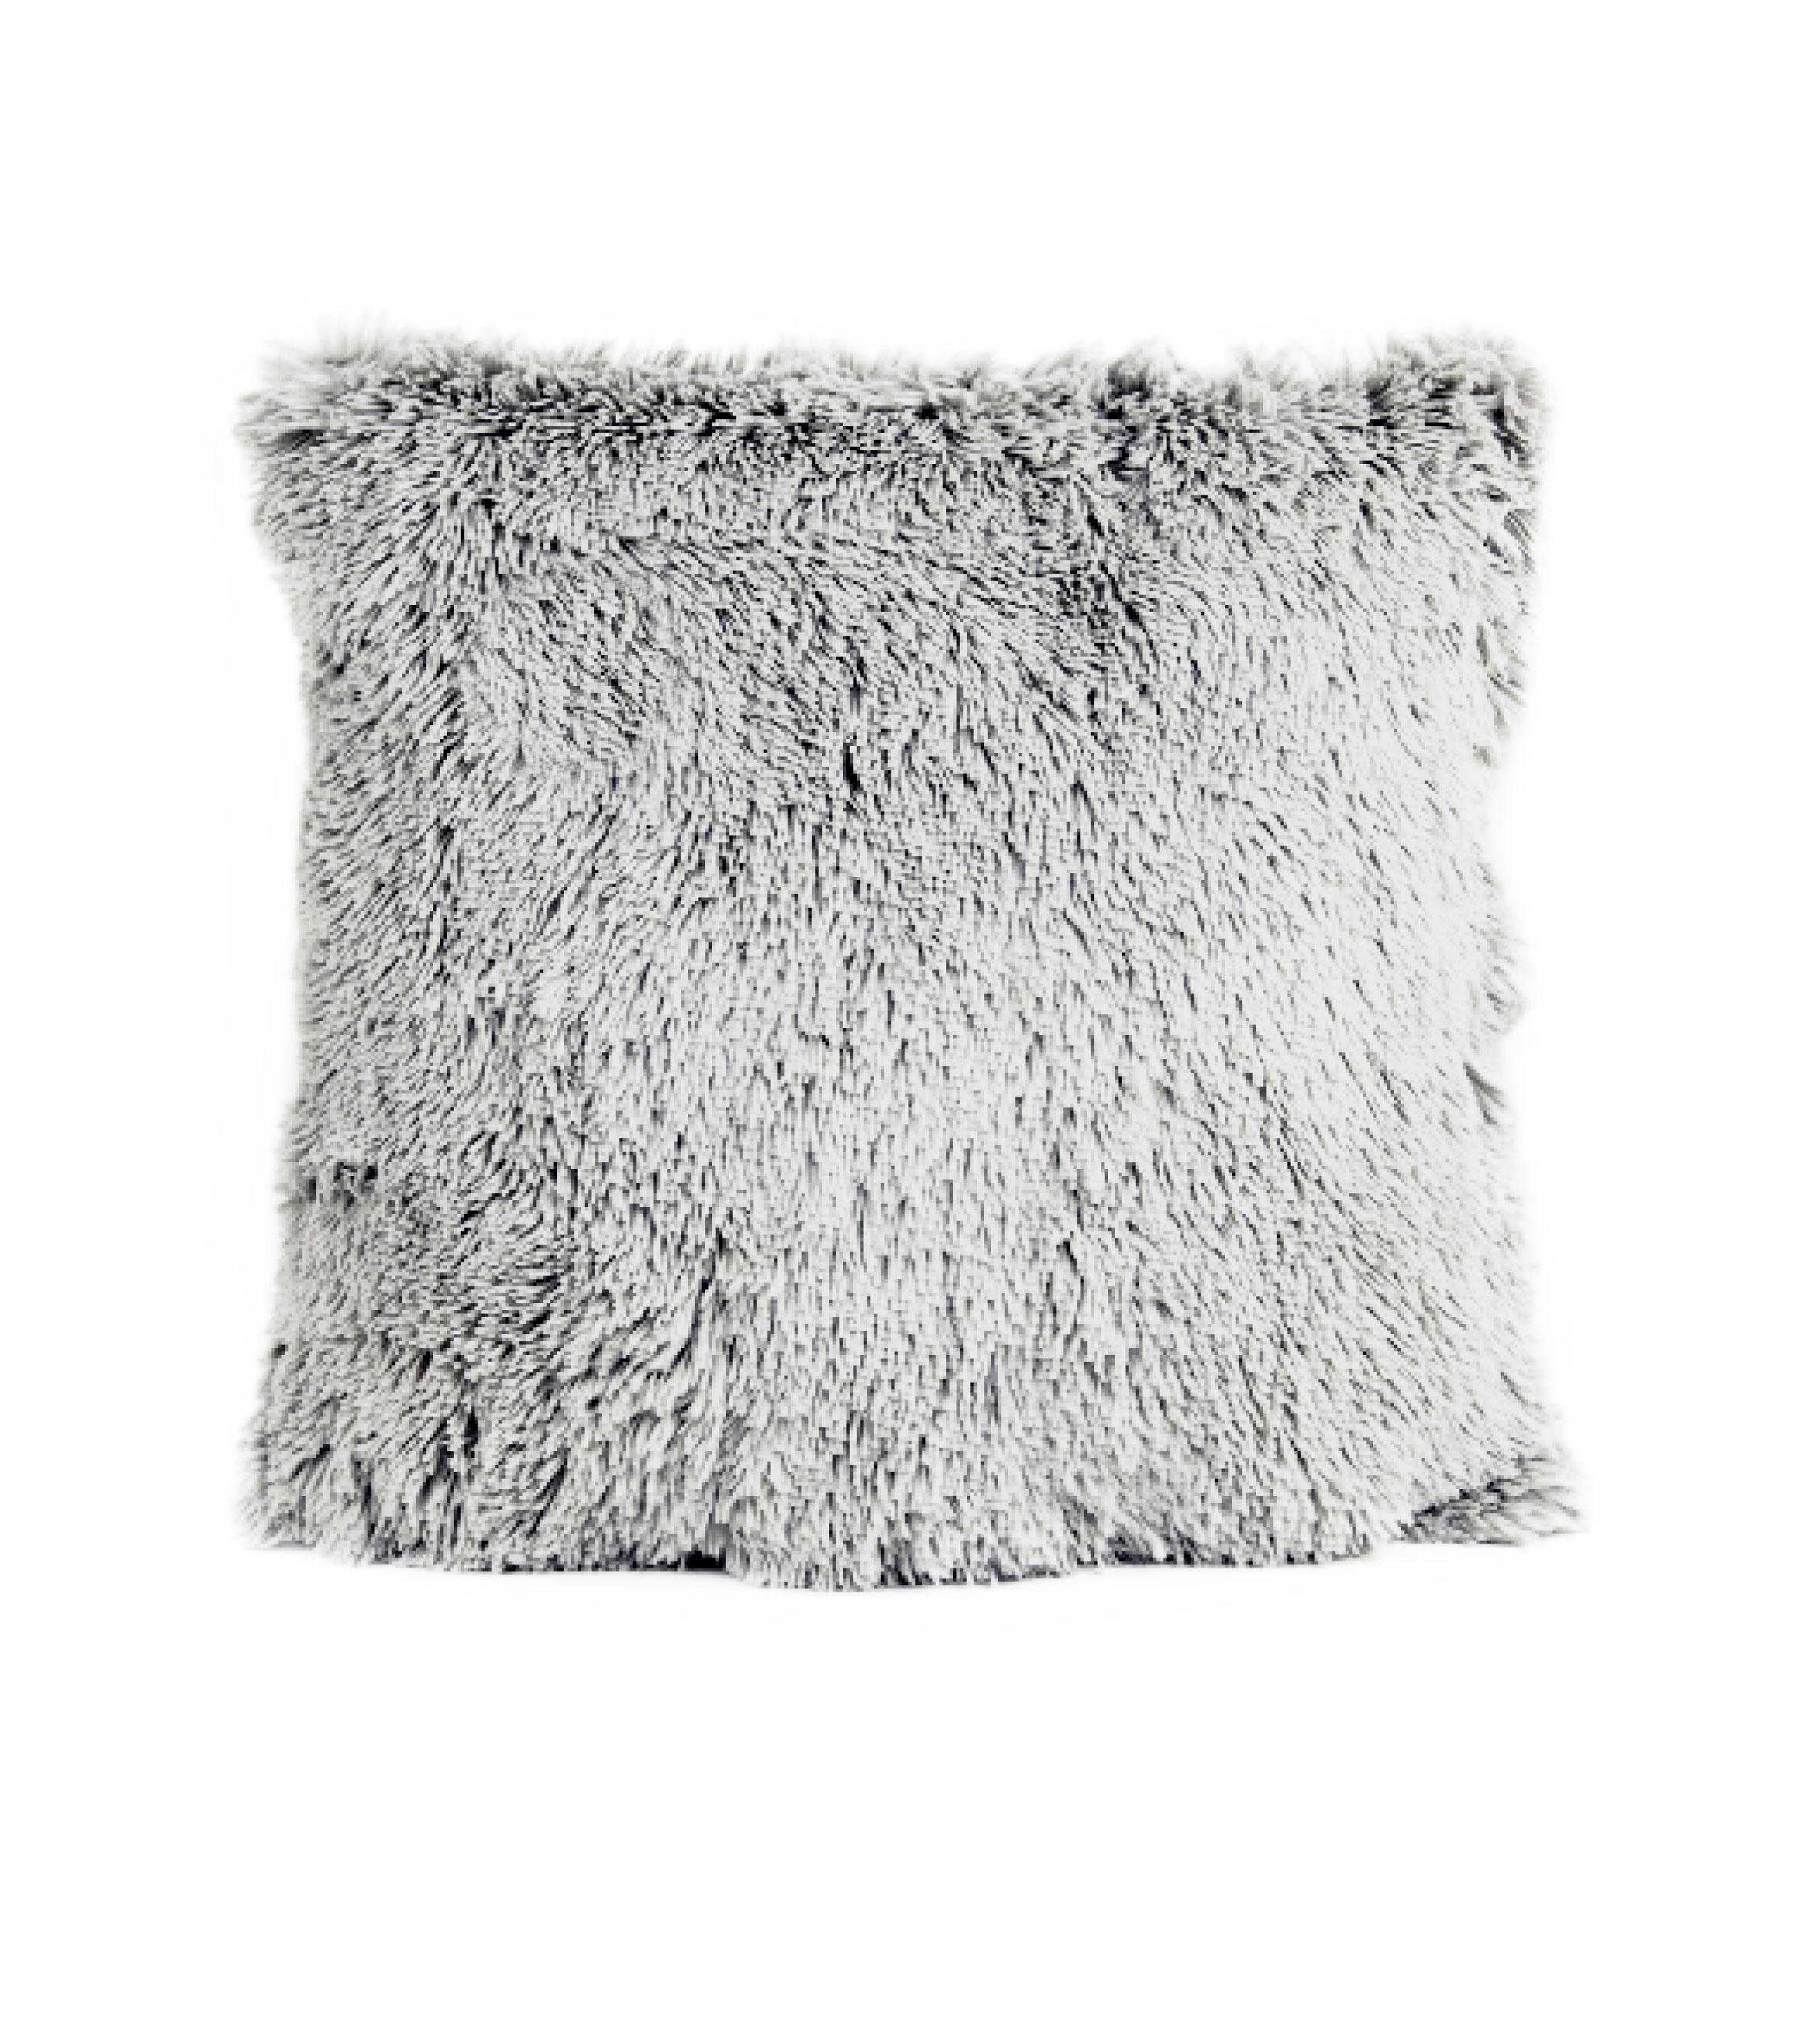 dekokissen chubby 50x50 cm vapor ohne f llkissen. Black Bedroom Furniture Sets. Home Design Ideas